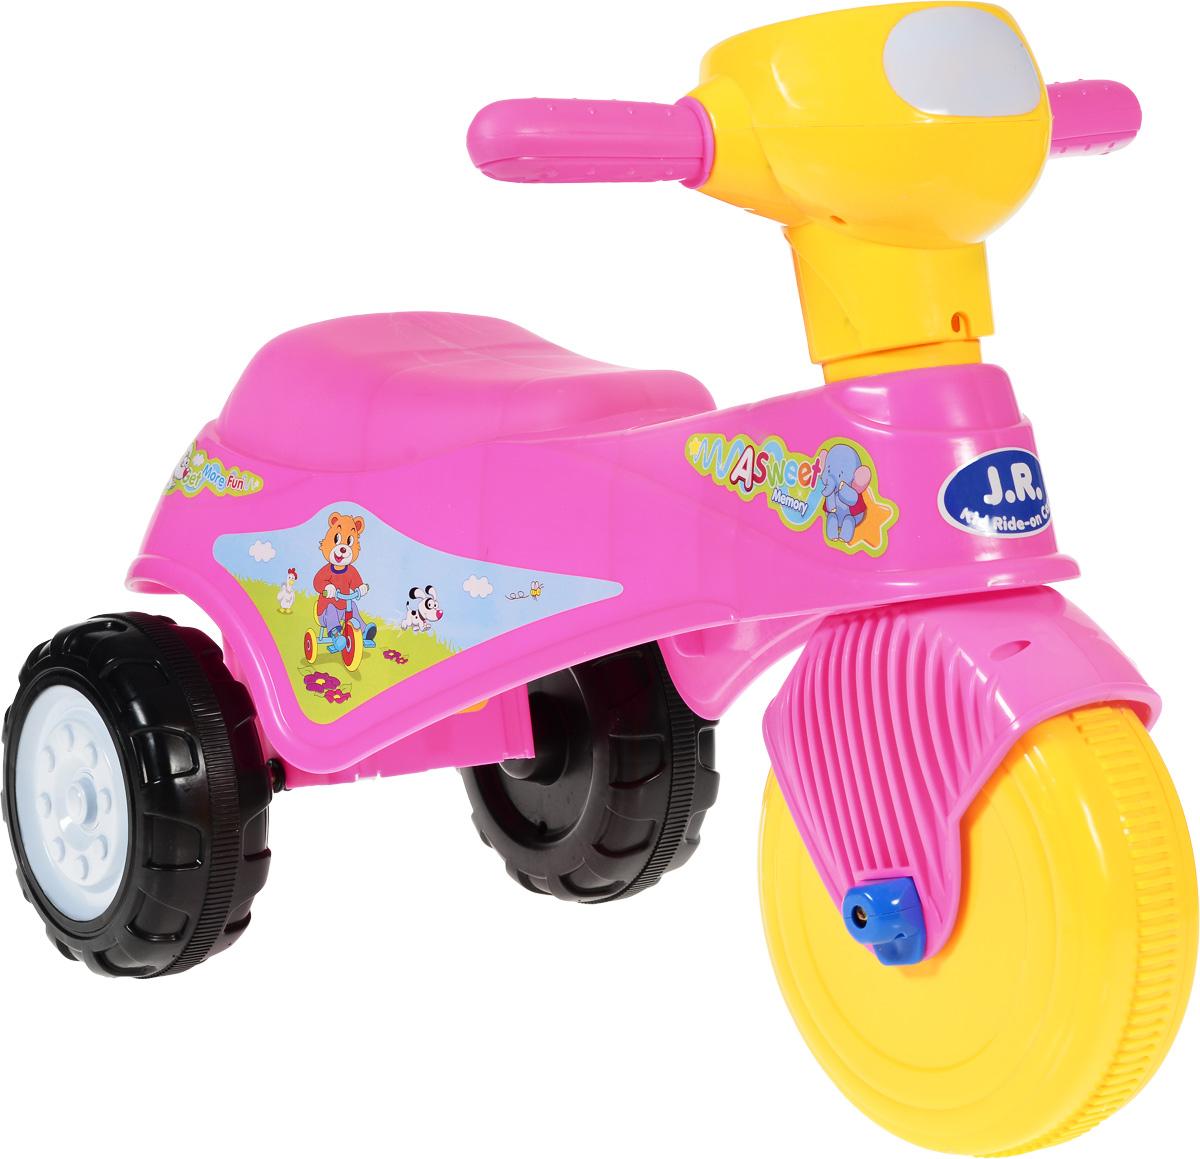 J.R. TOYS Каталка детская Трицикл цвет розовый